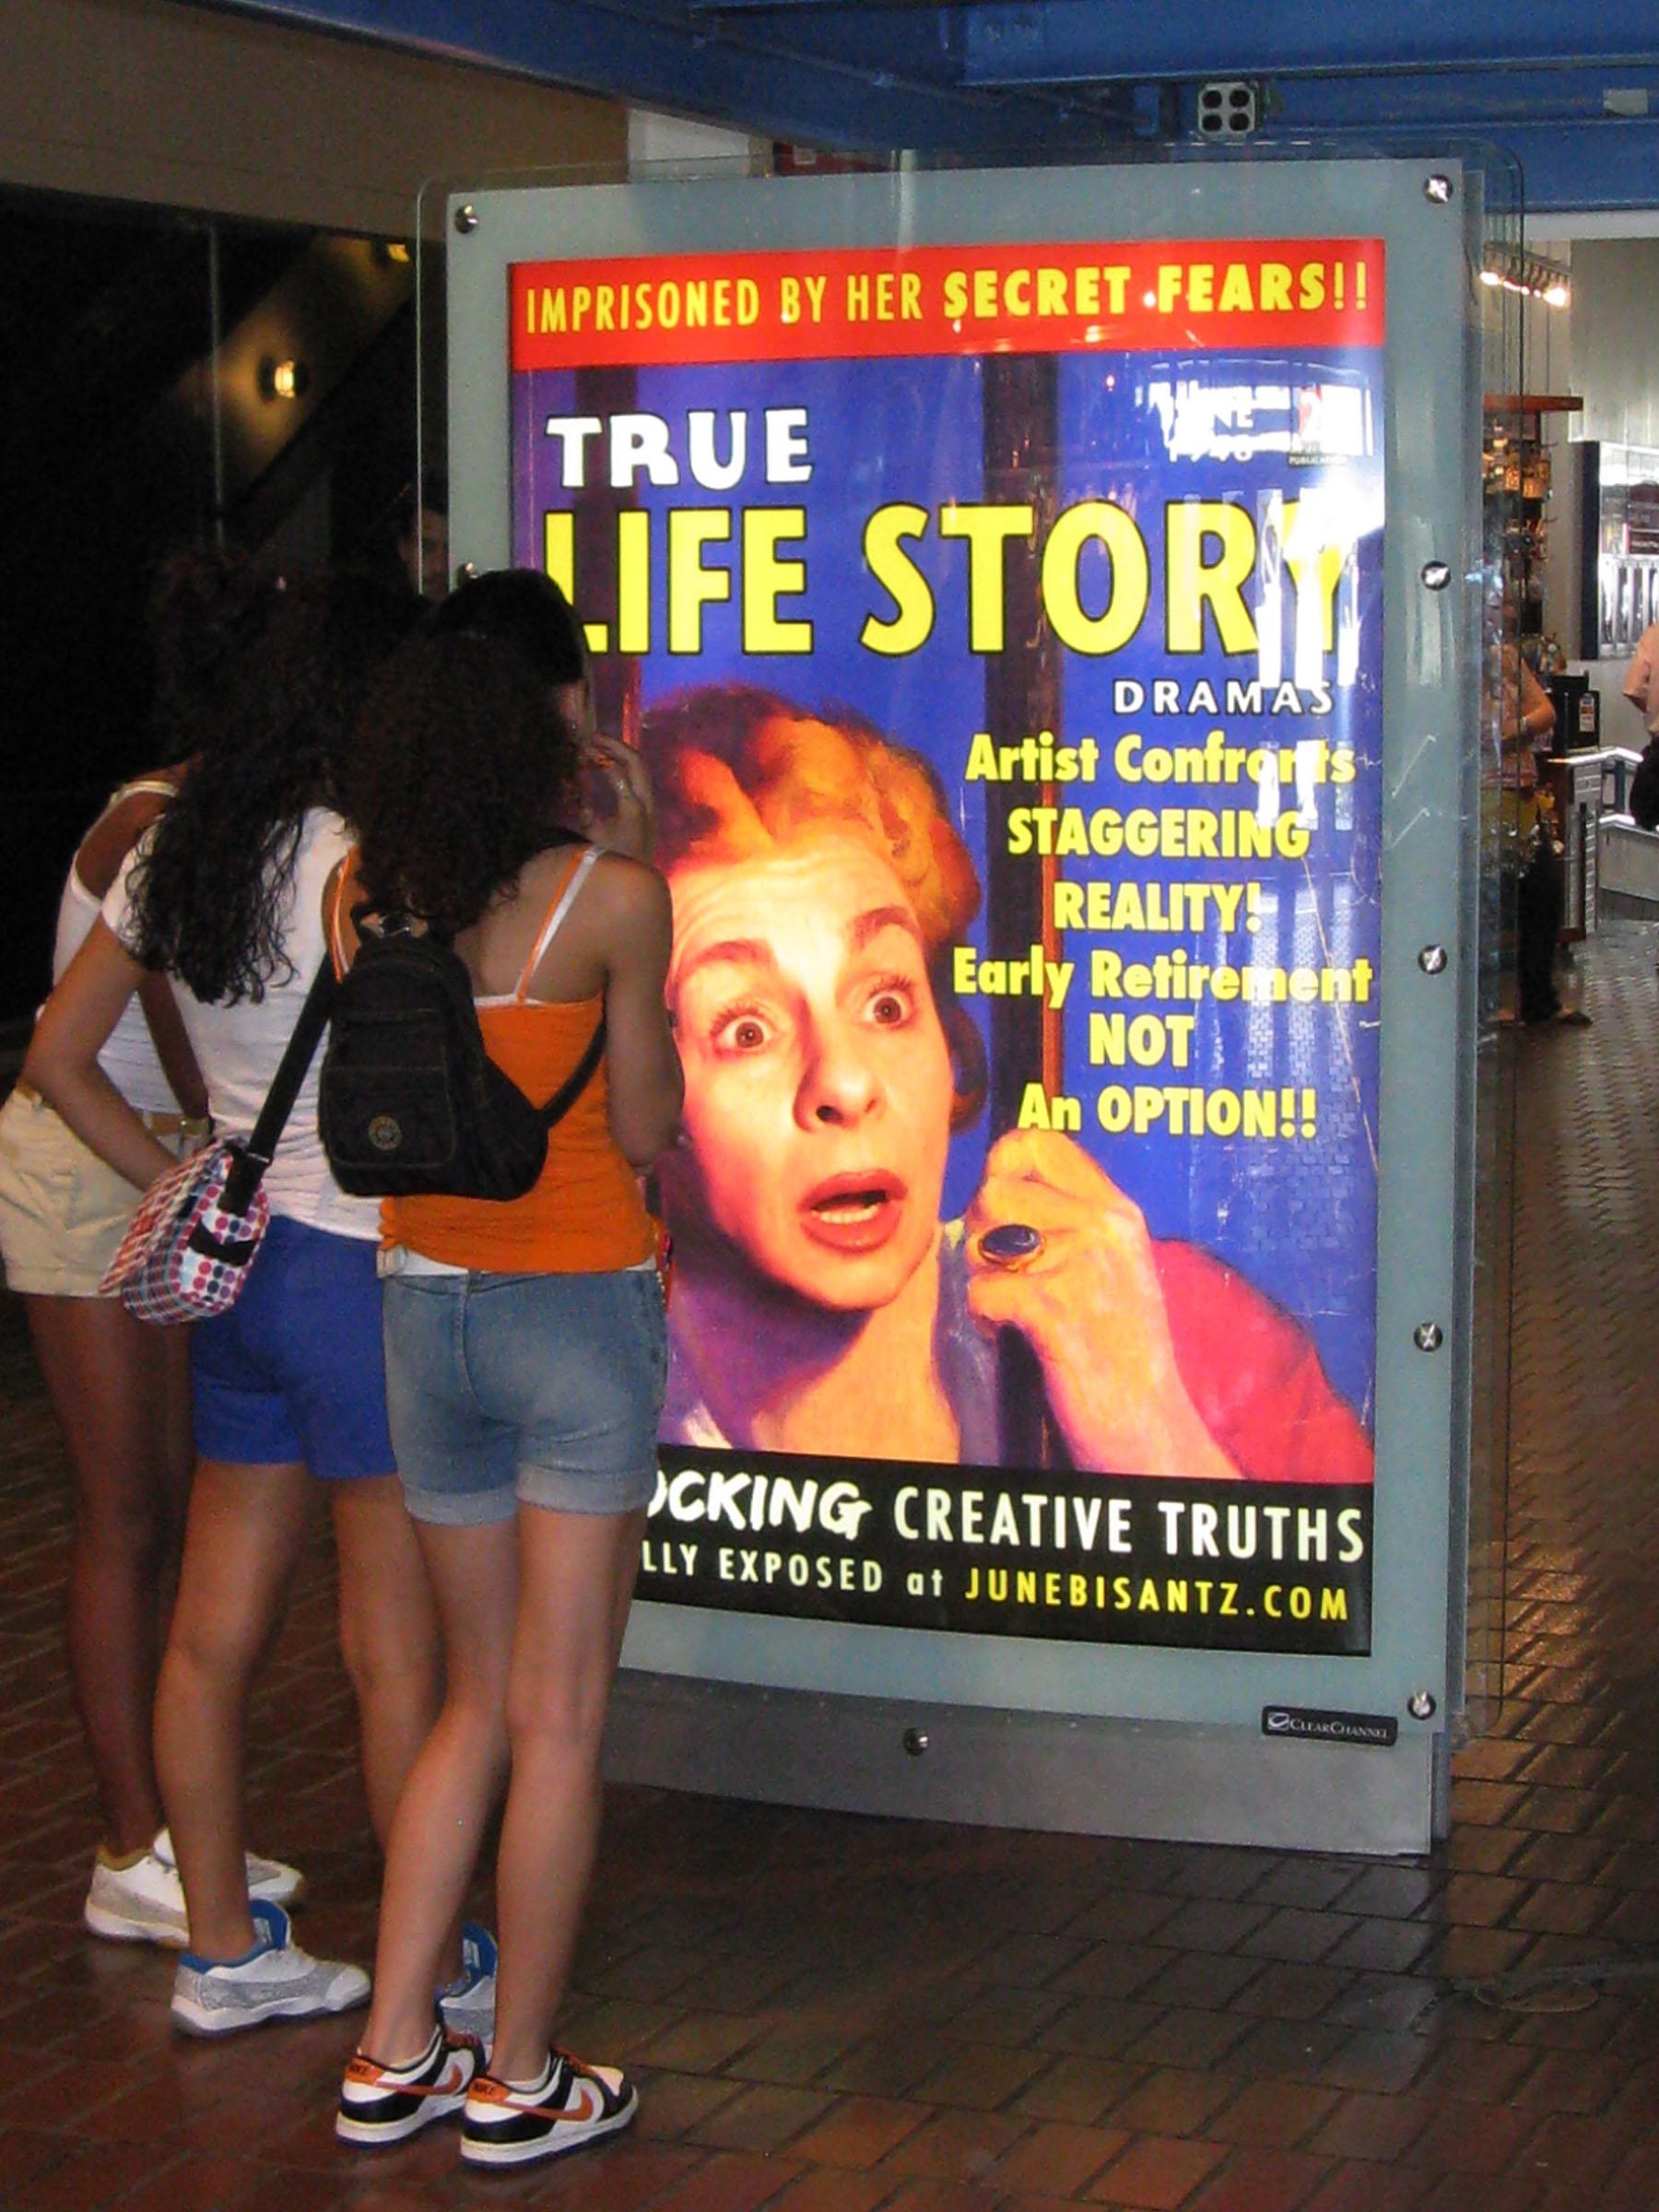 True Life Story Dramas